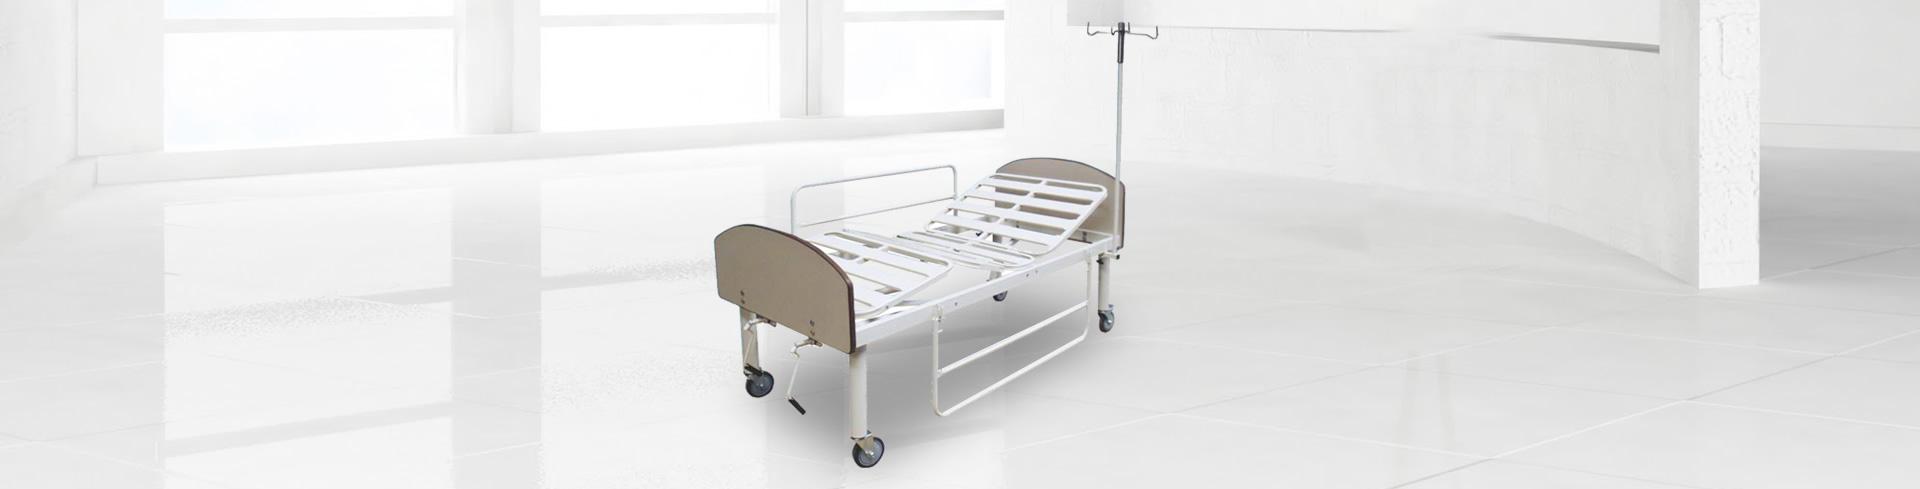 cama-hospitalaria-manual